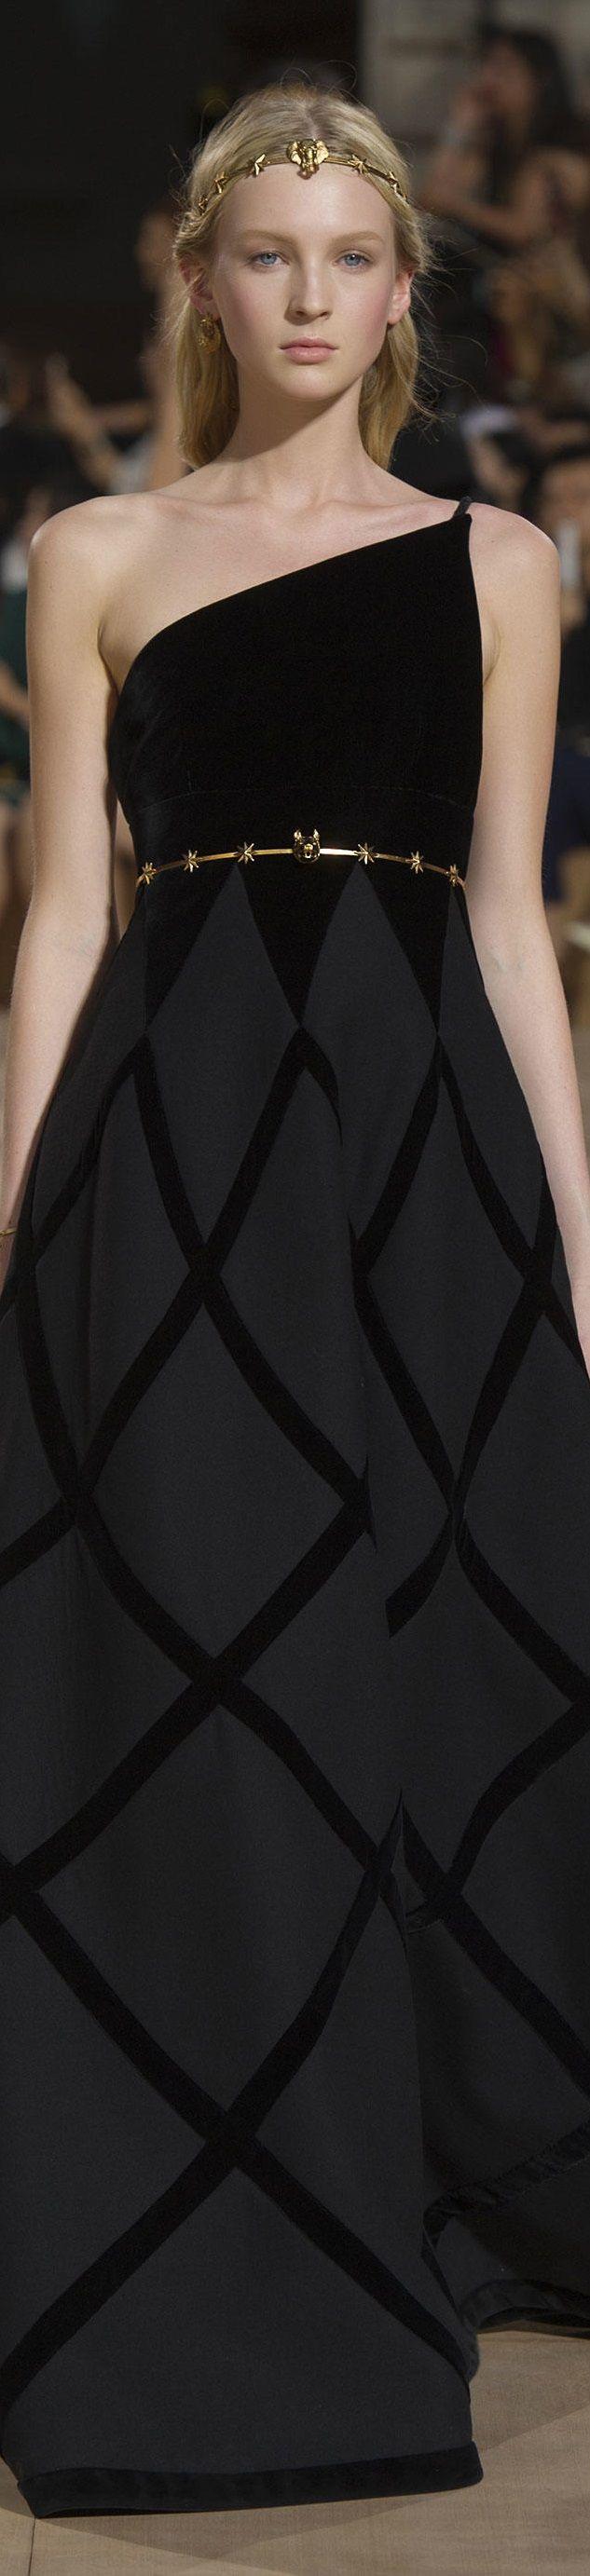 Valentino FW 2015 couture www.valentino.com jαɢlαdy